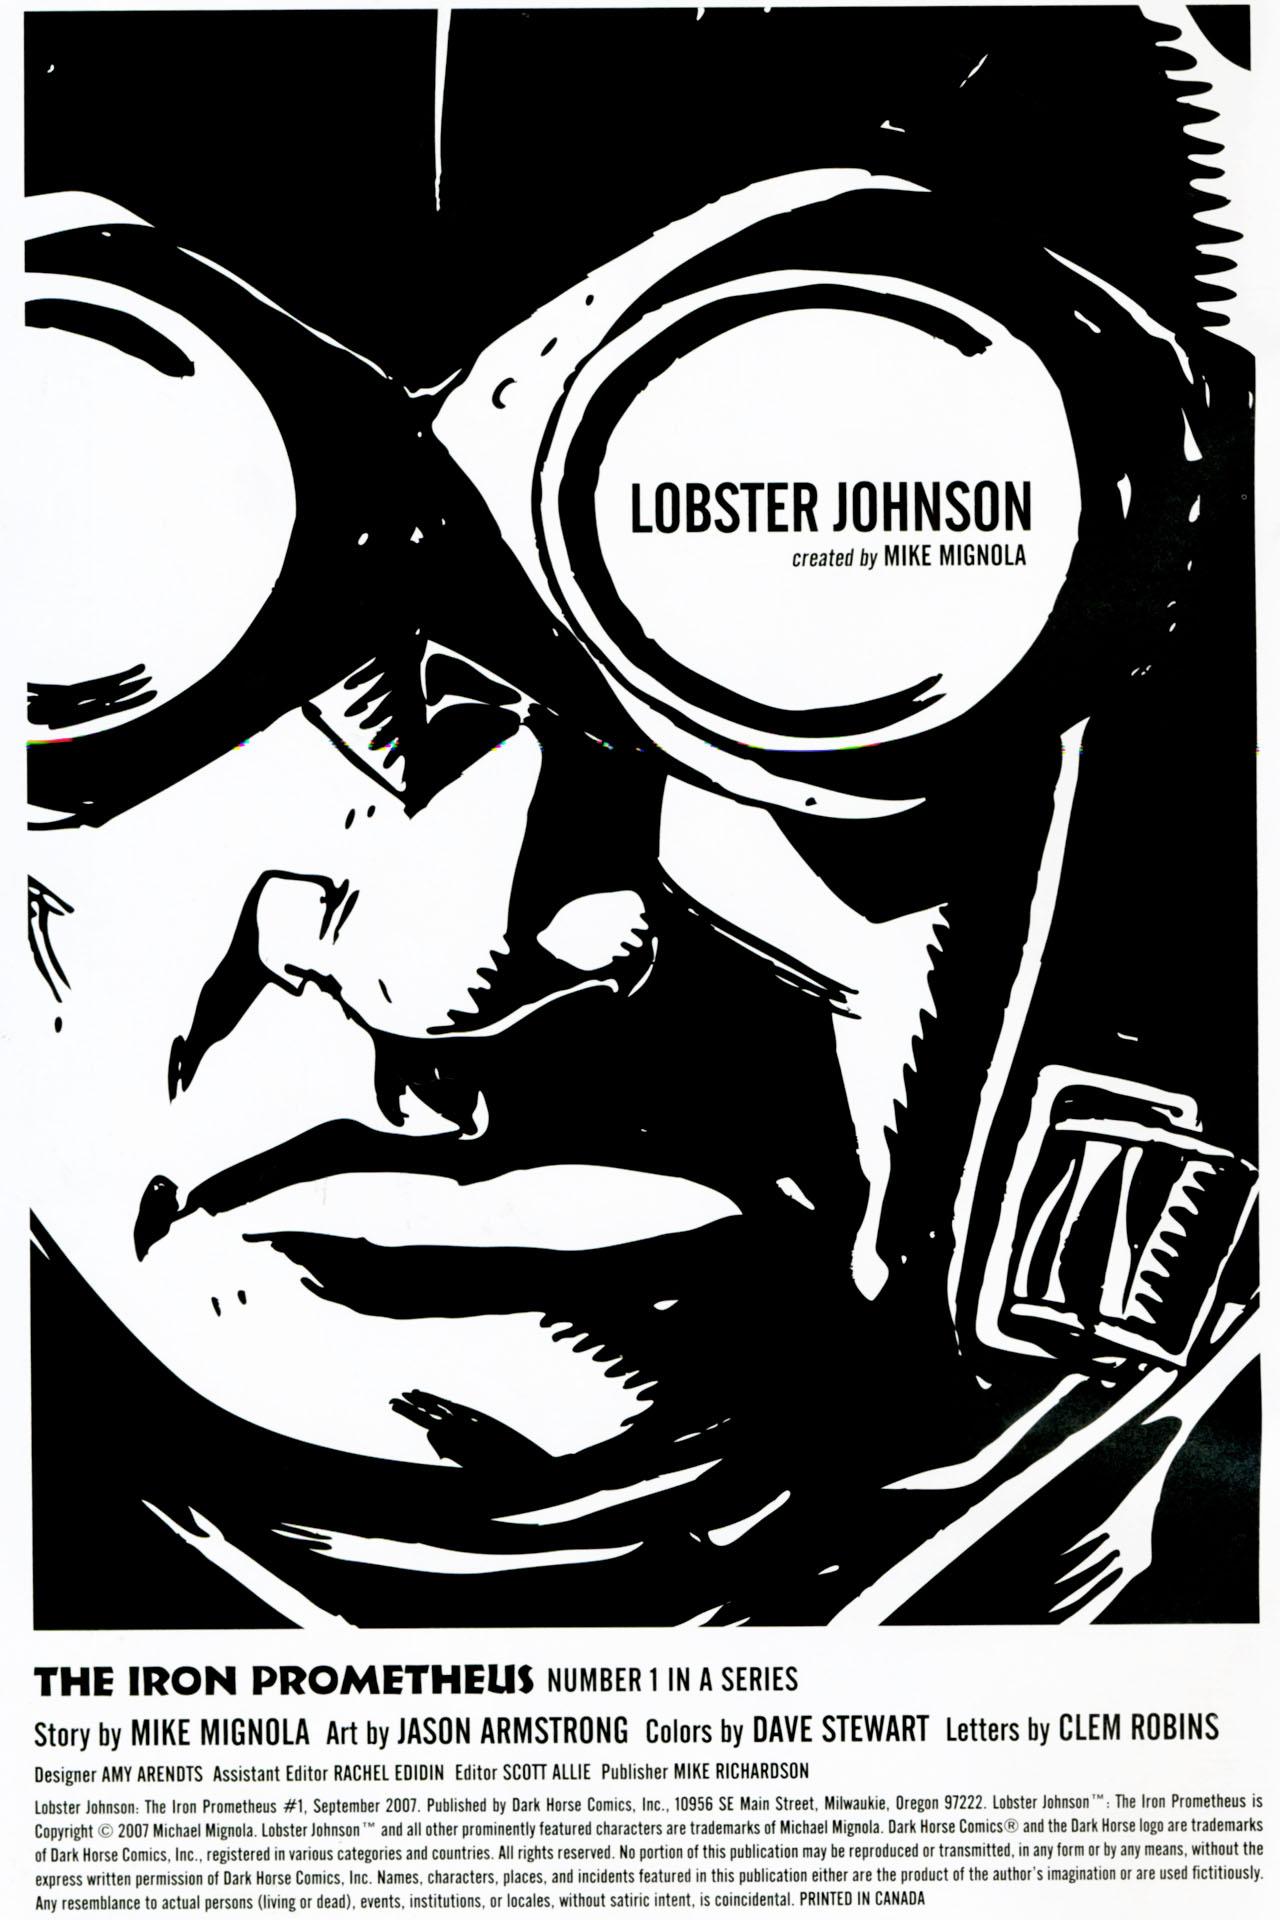 Read online Lobster Johnson: The Iron Prometheus comic -  Issue #1 - 2